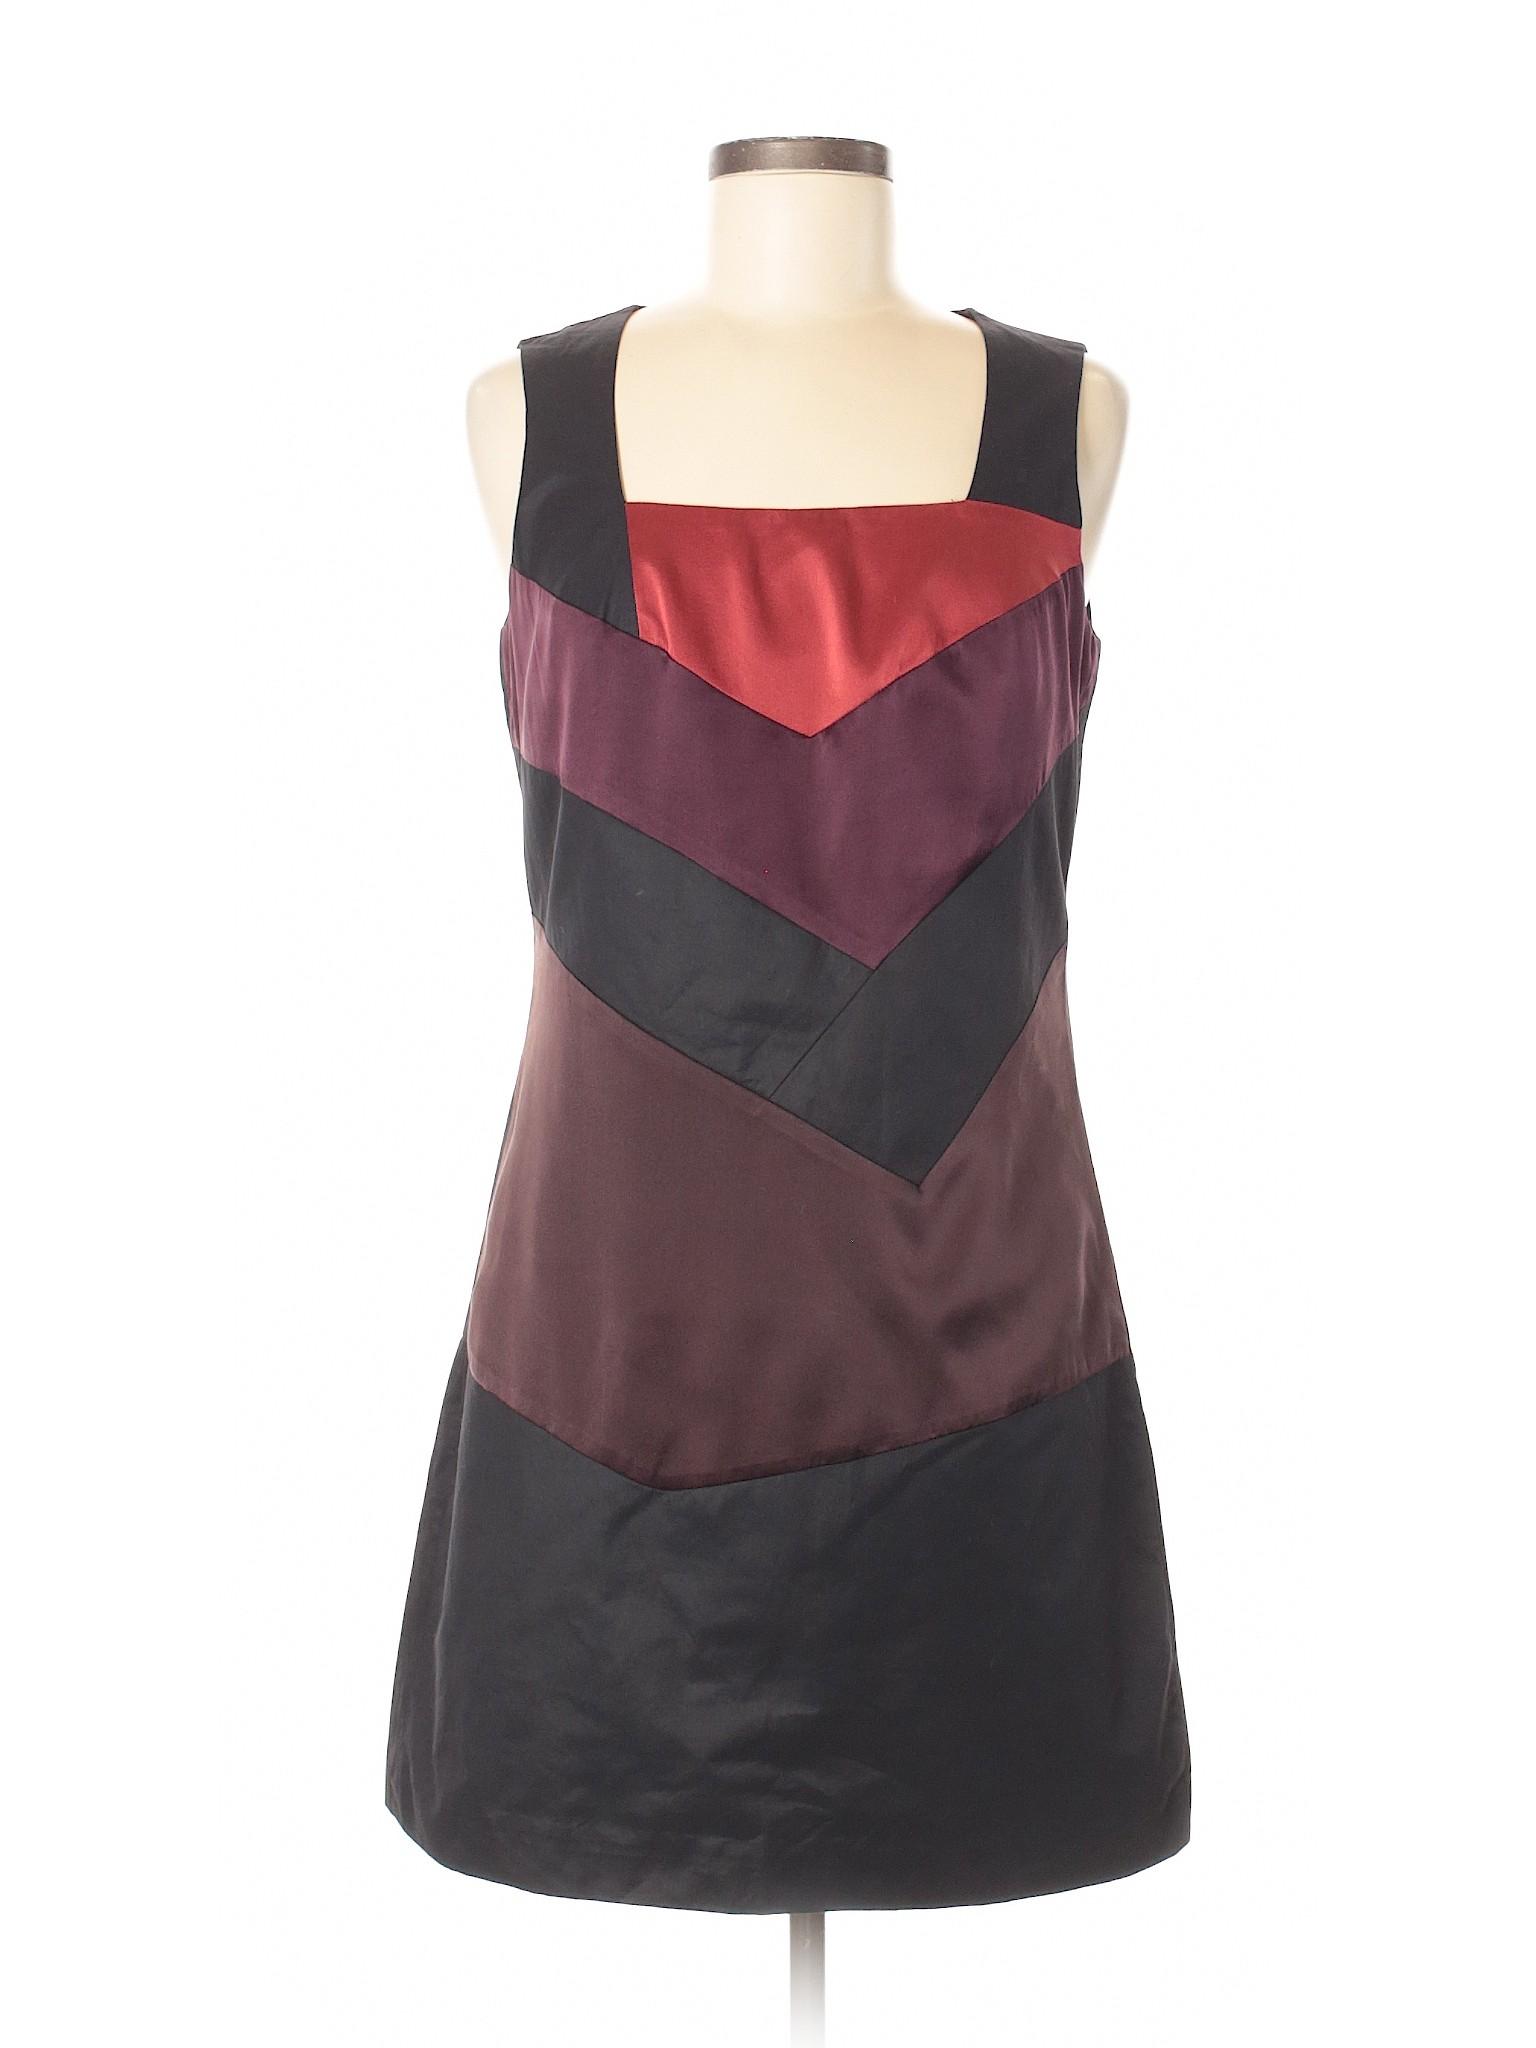 Casual winter winter Casual Casual Boutique Dress Dress Boutique Boutique winter Parameter Parameter Parameter Dress qpY8twI